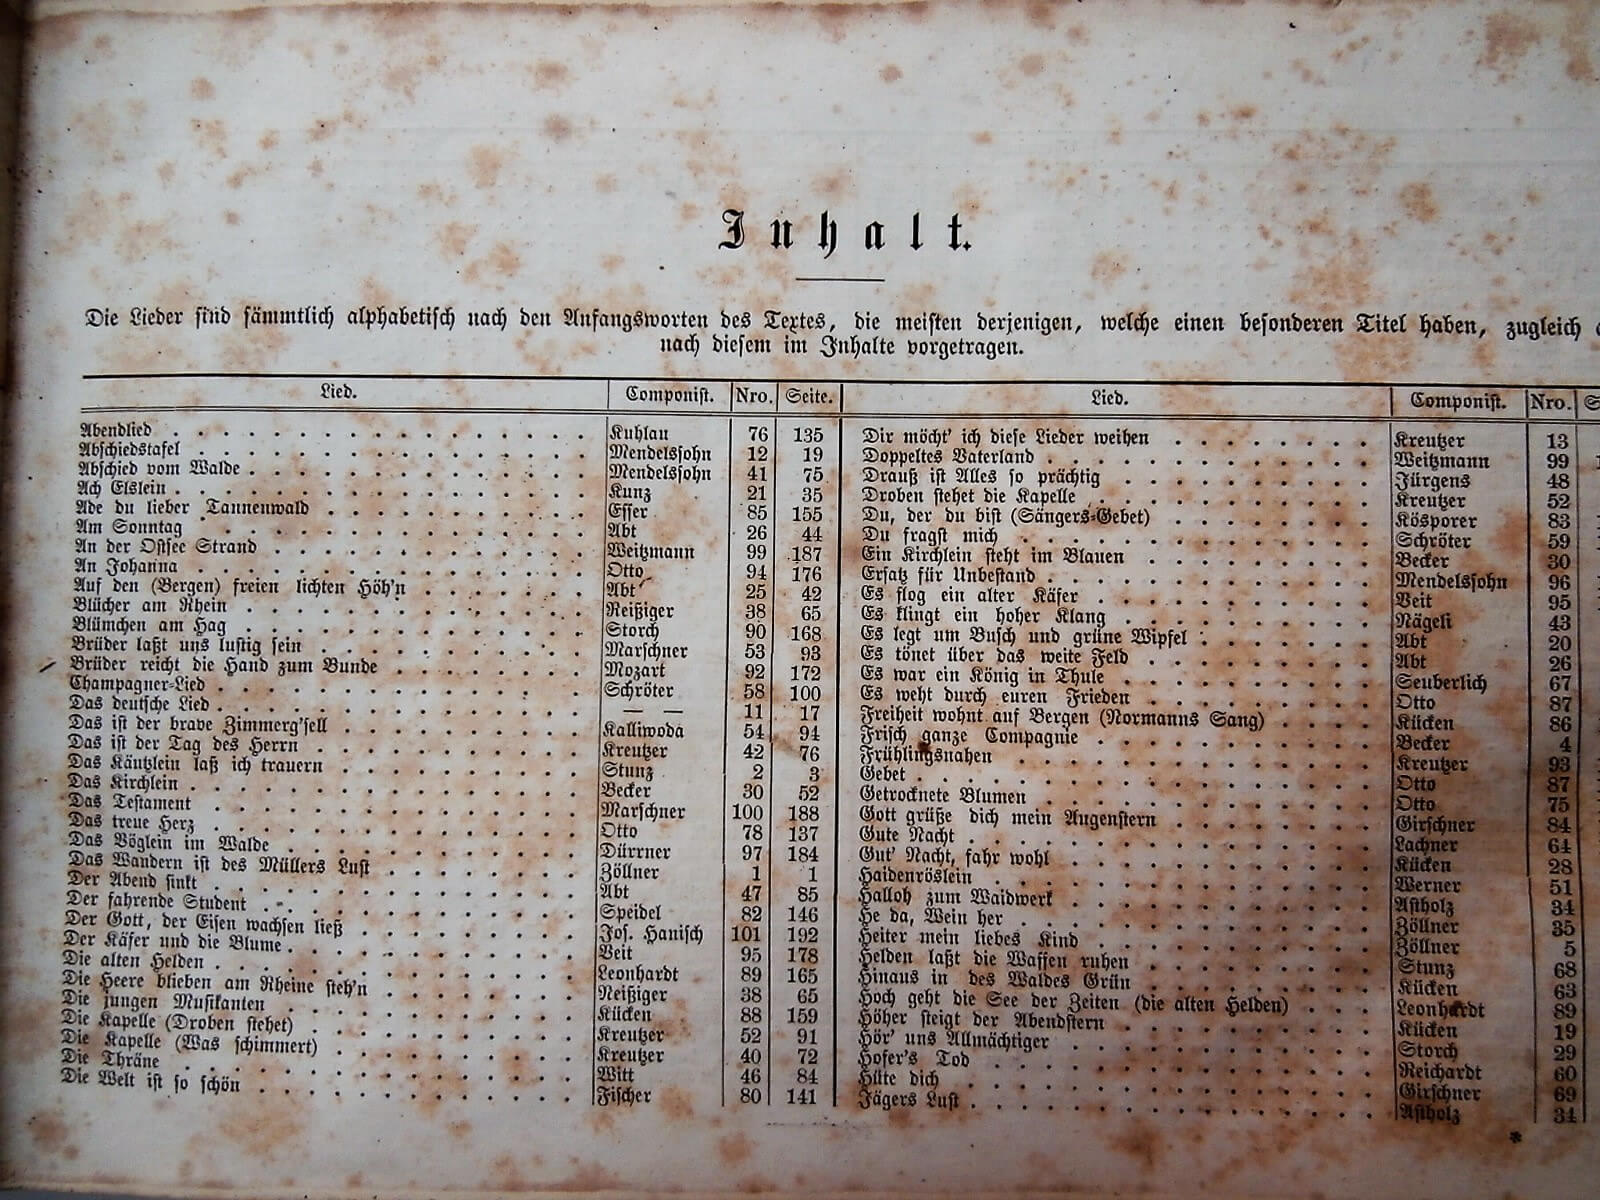 Regensburger Liederkranz Sammlung 1866